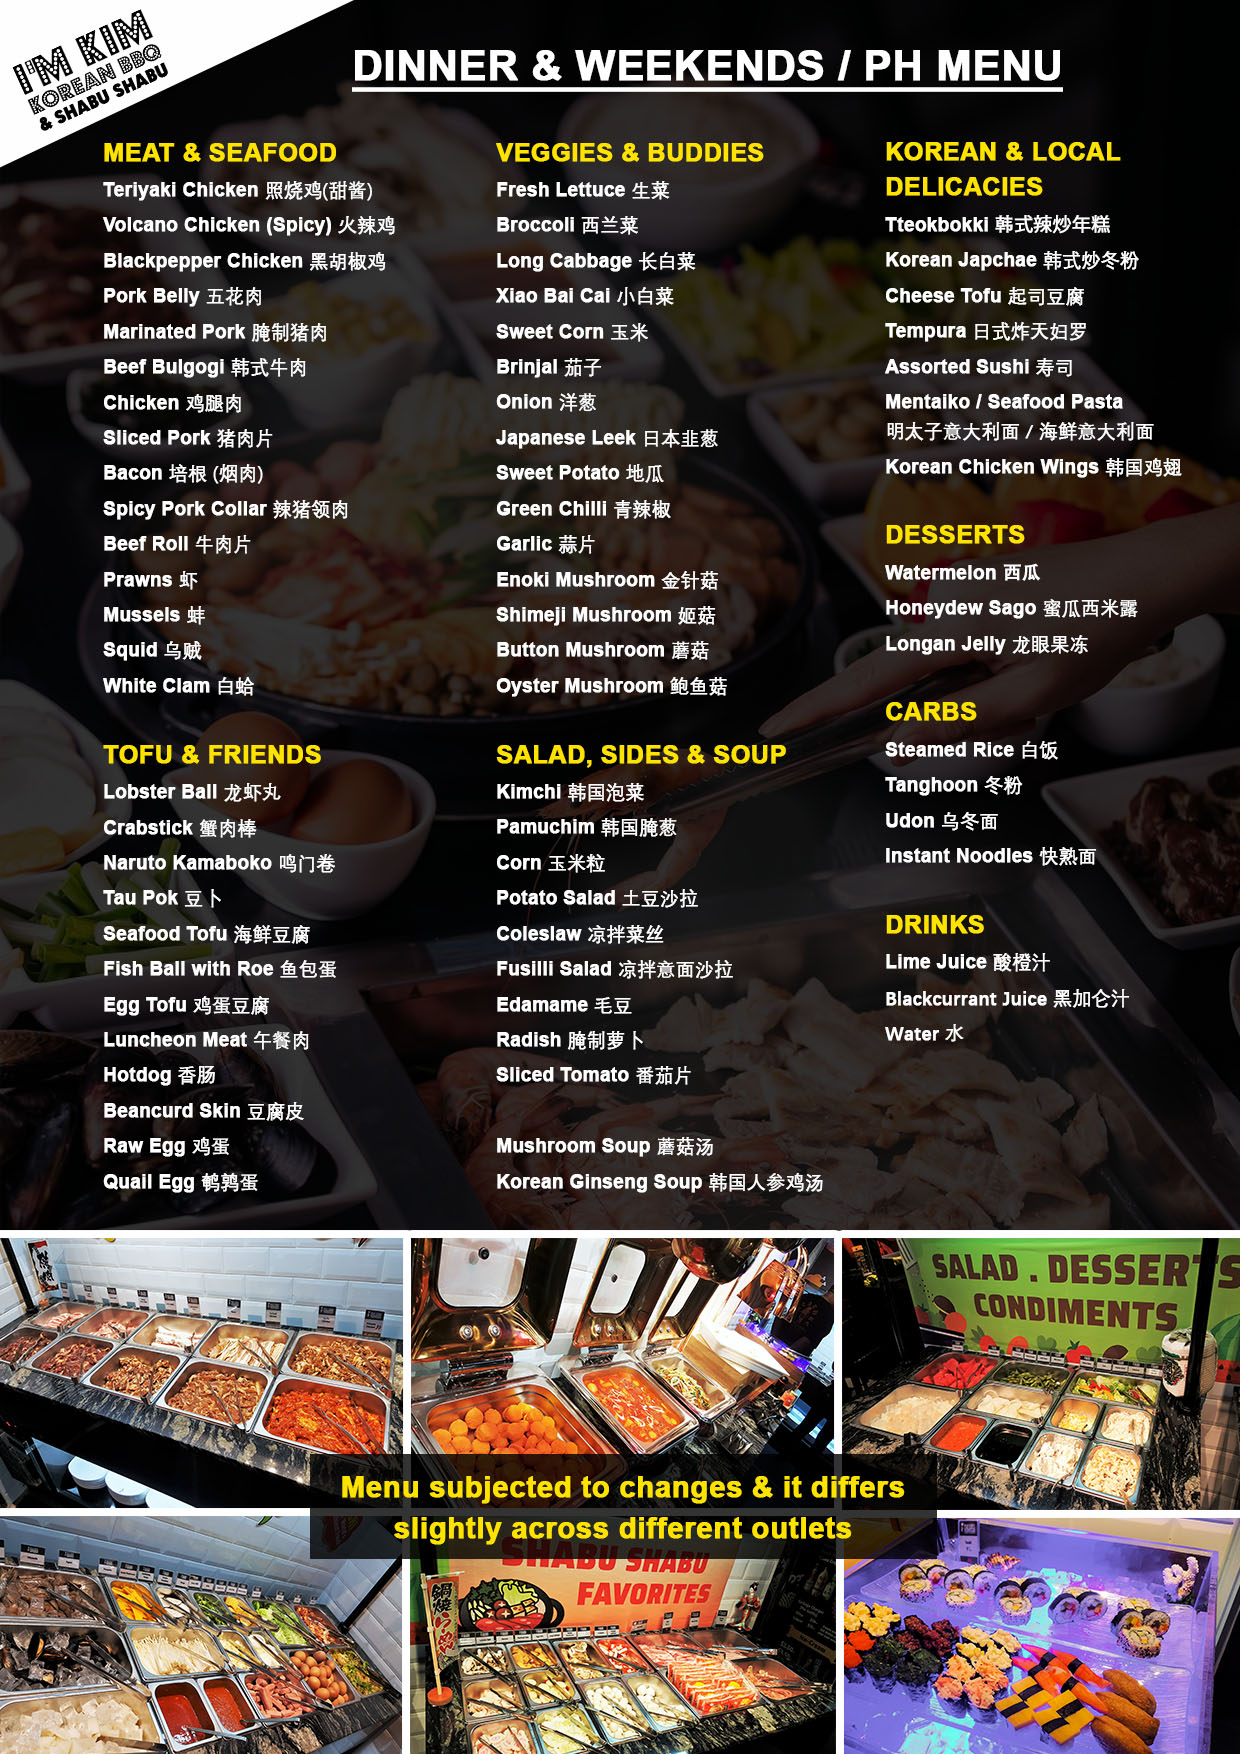 Buffet Menu 2021 (Shabu Dinner & Wkends)